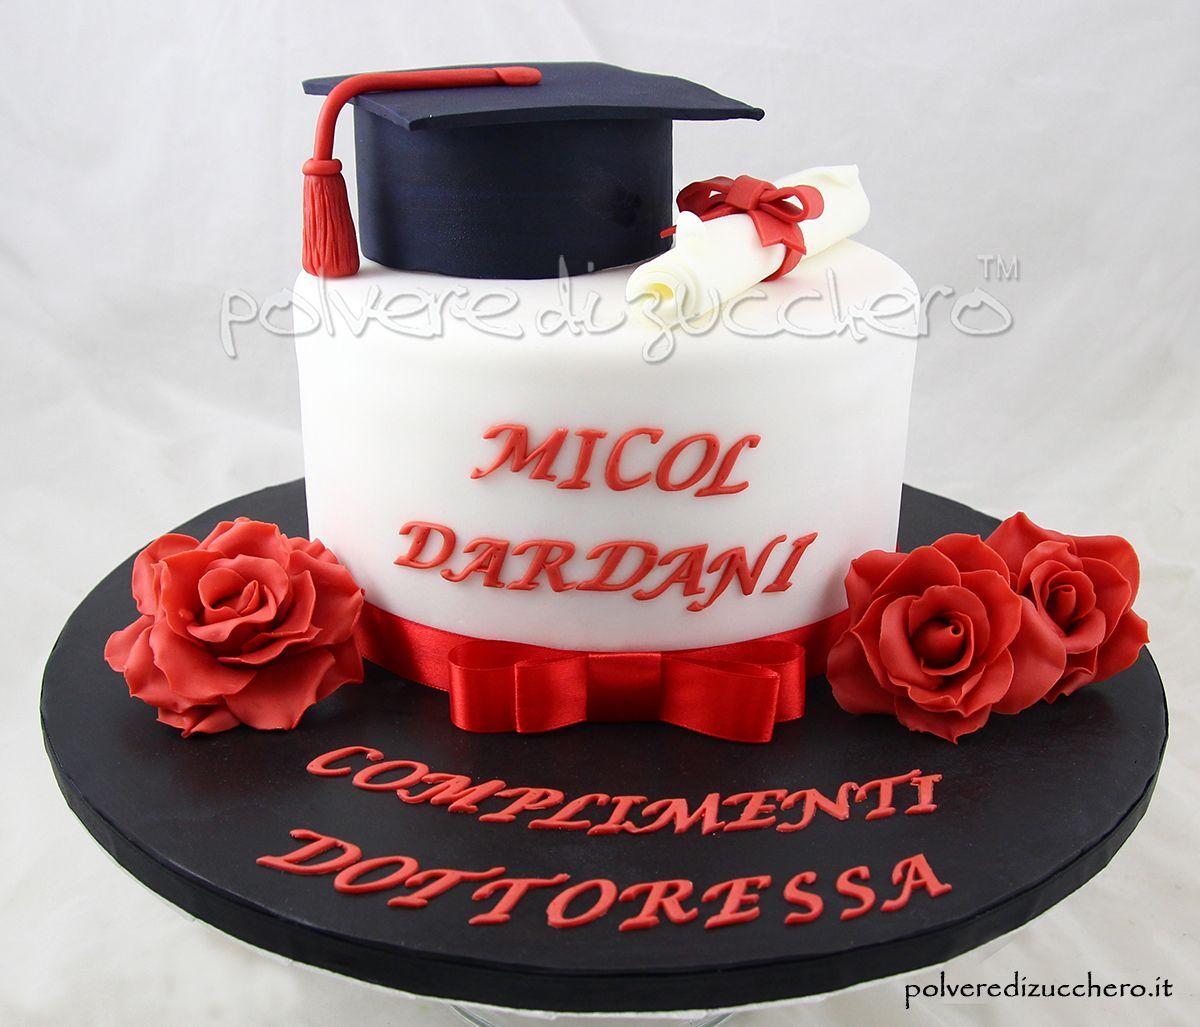 Torta laurea con toco pergamen e rose in pasta di zucchero graduated cake  with Toco parchment and roses sugar paste 2f17d21579af